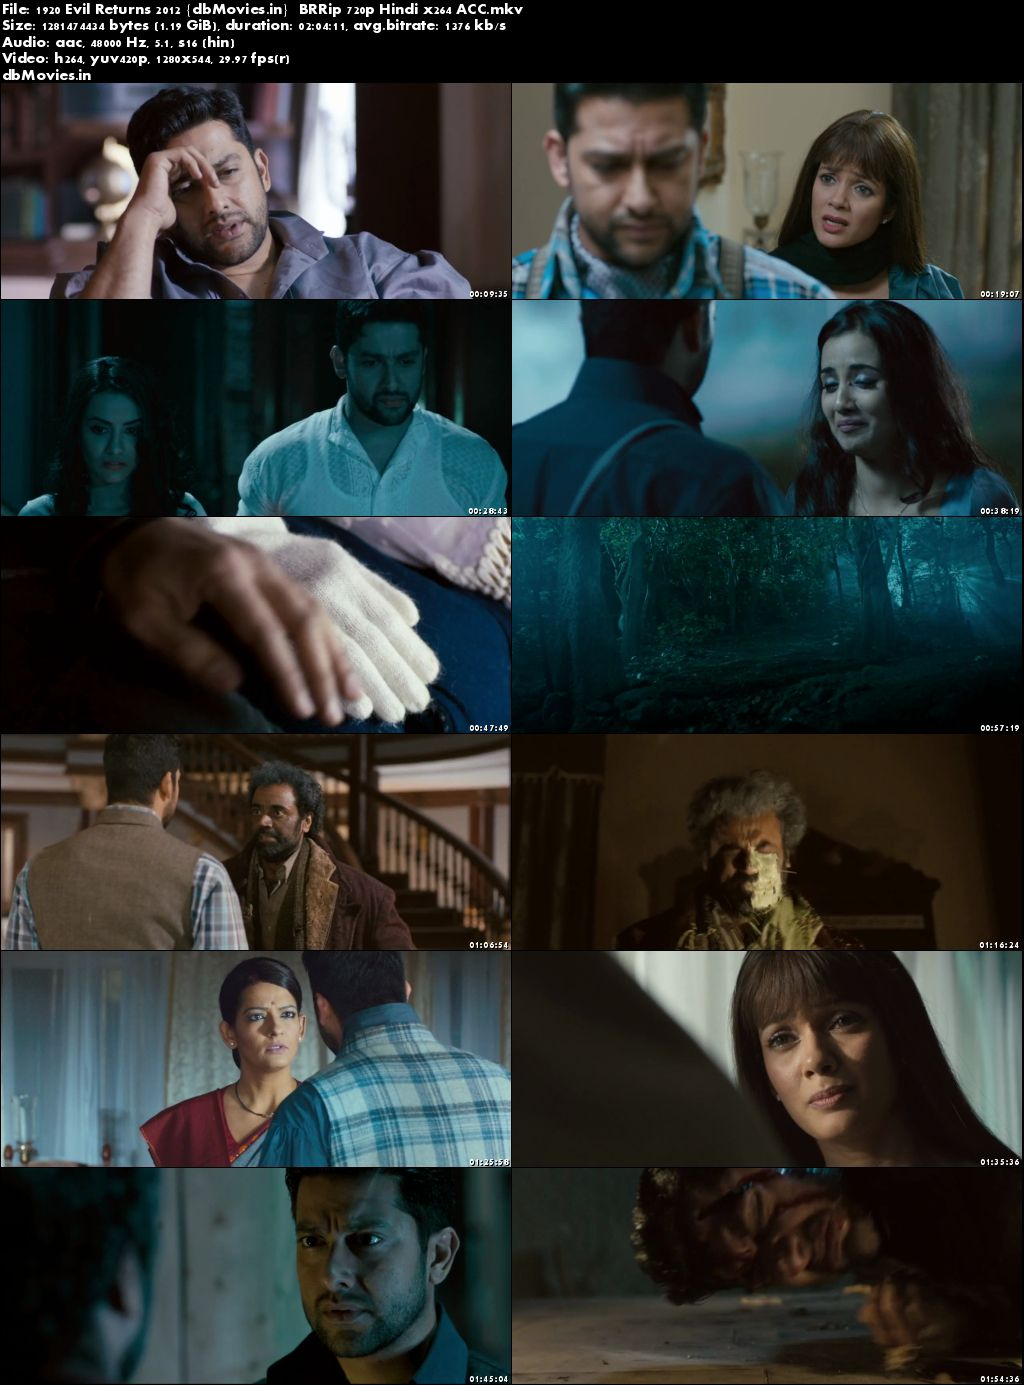 Screen Shots 1920: Evil Returns 2012 Full Movie Download Hindi HD 720p